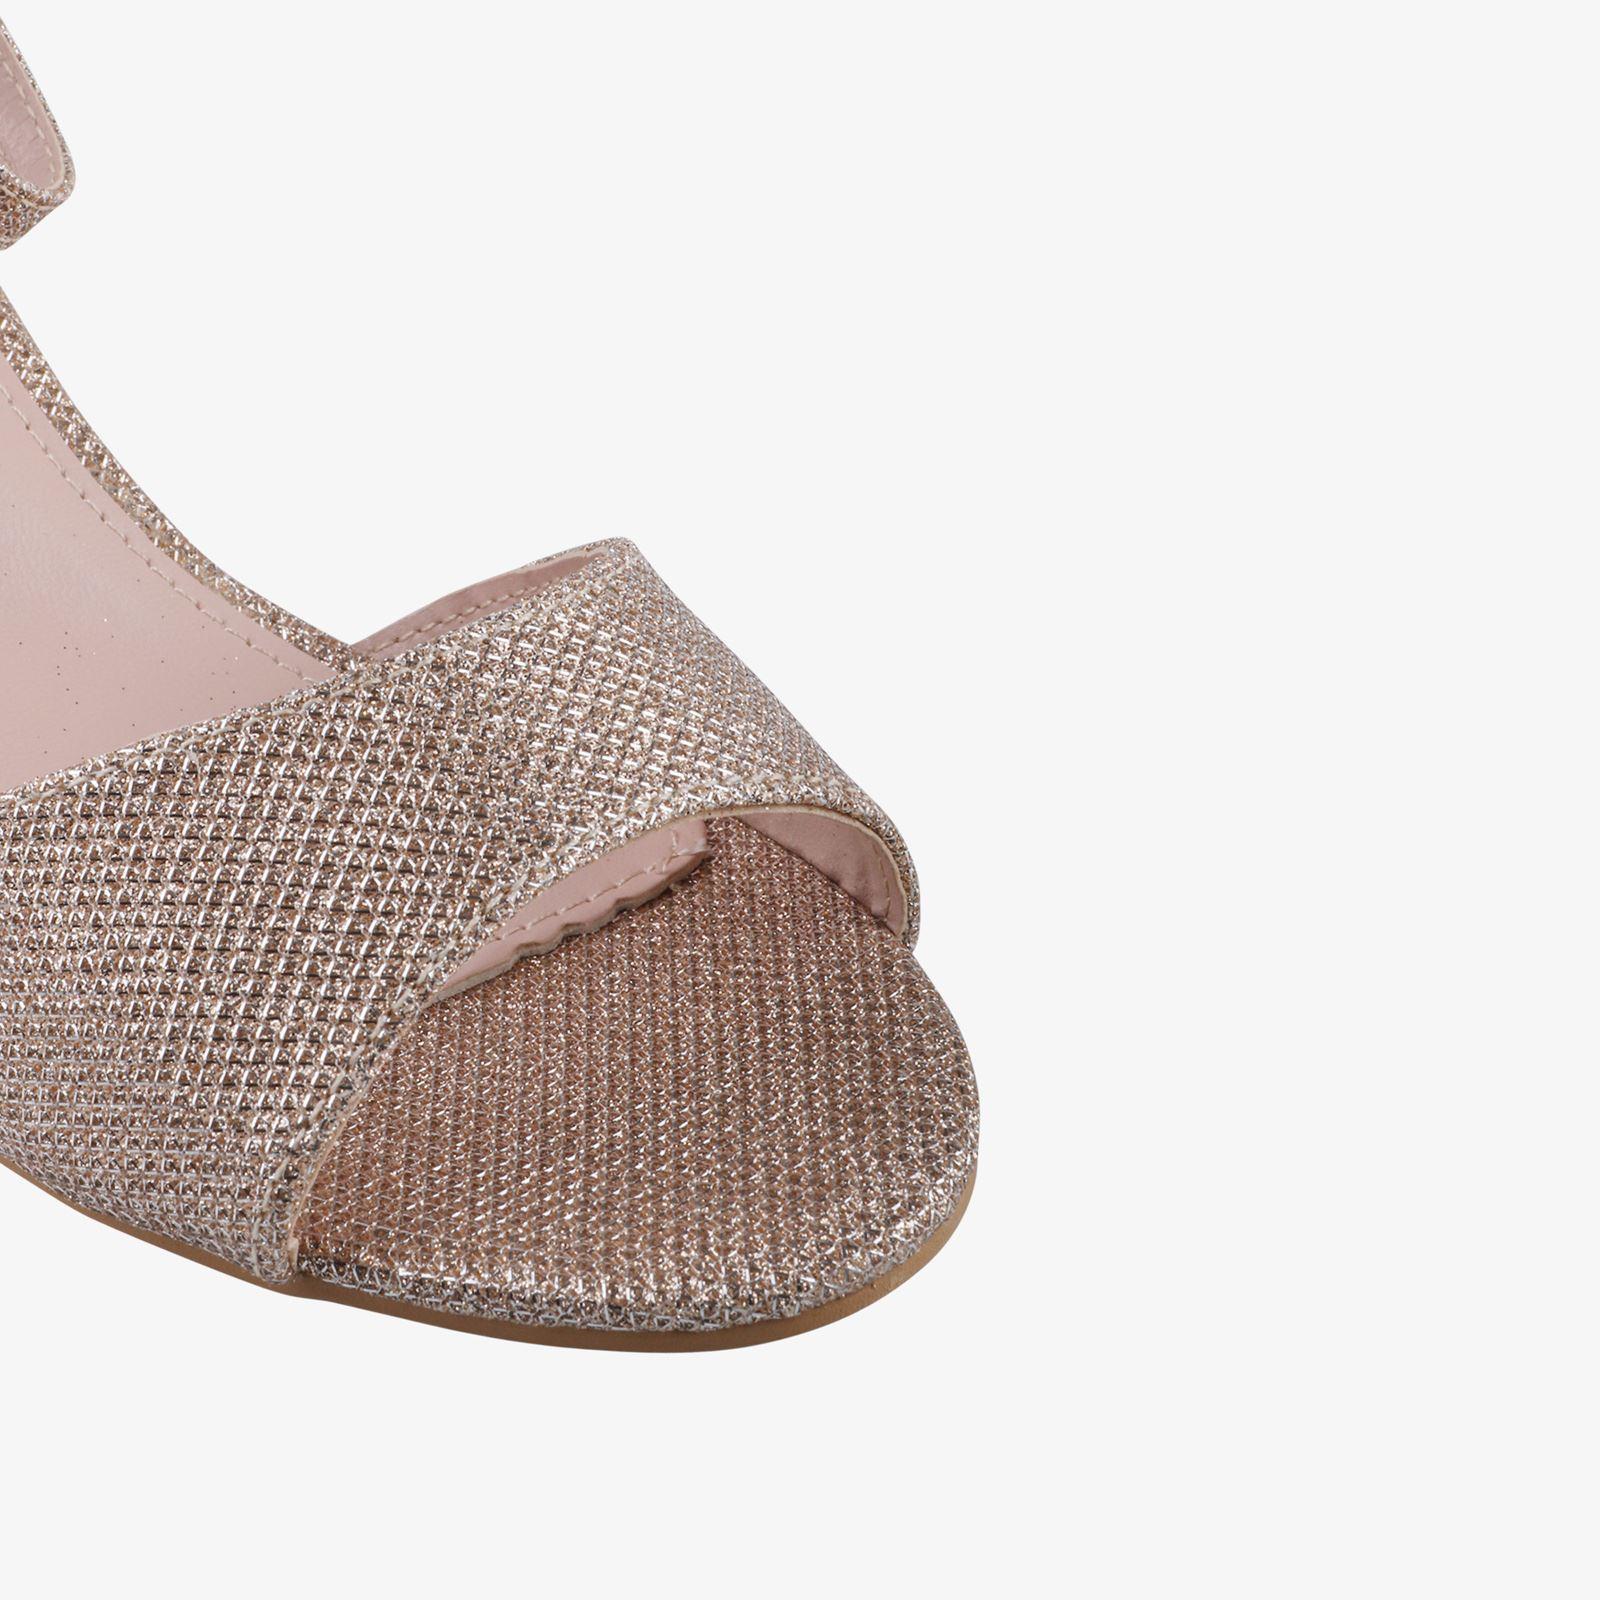 Women-Ladies-Low-Kitten-Heel-Court-Shoes-Open-Toe-Glitter-Sandals-Party-Bridal thumbnail 3